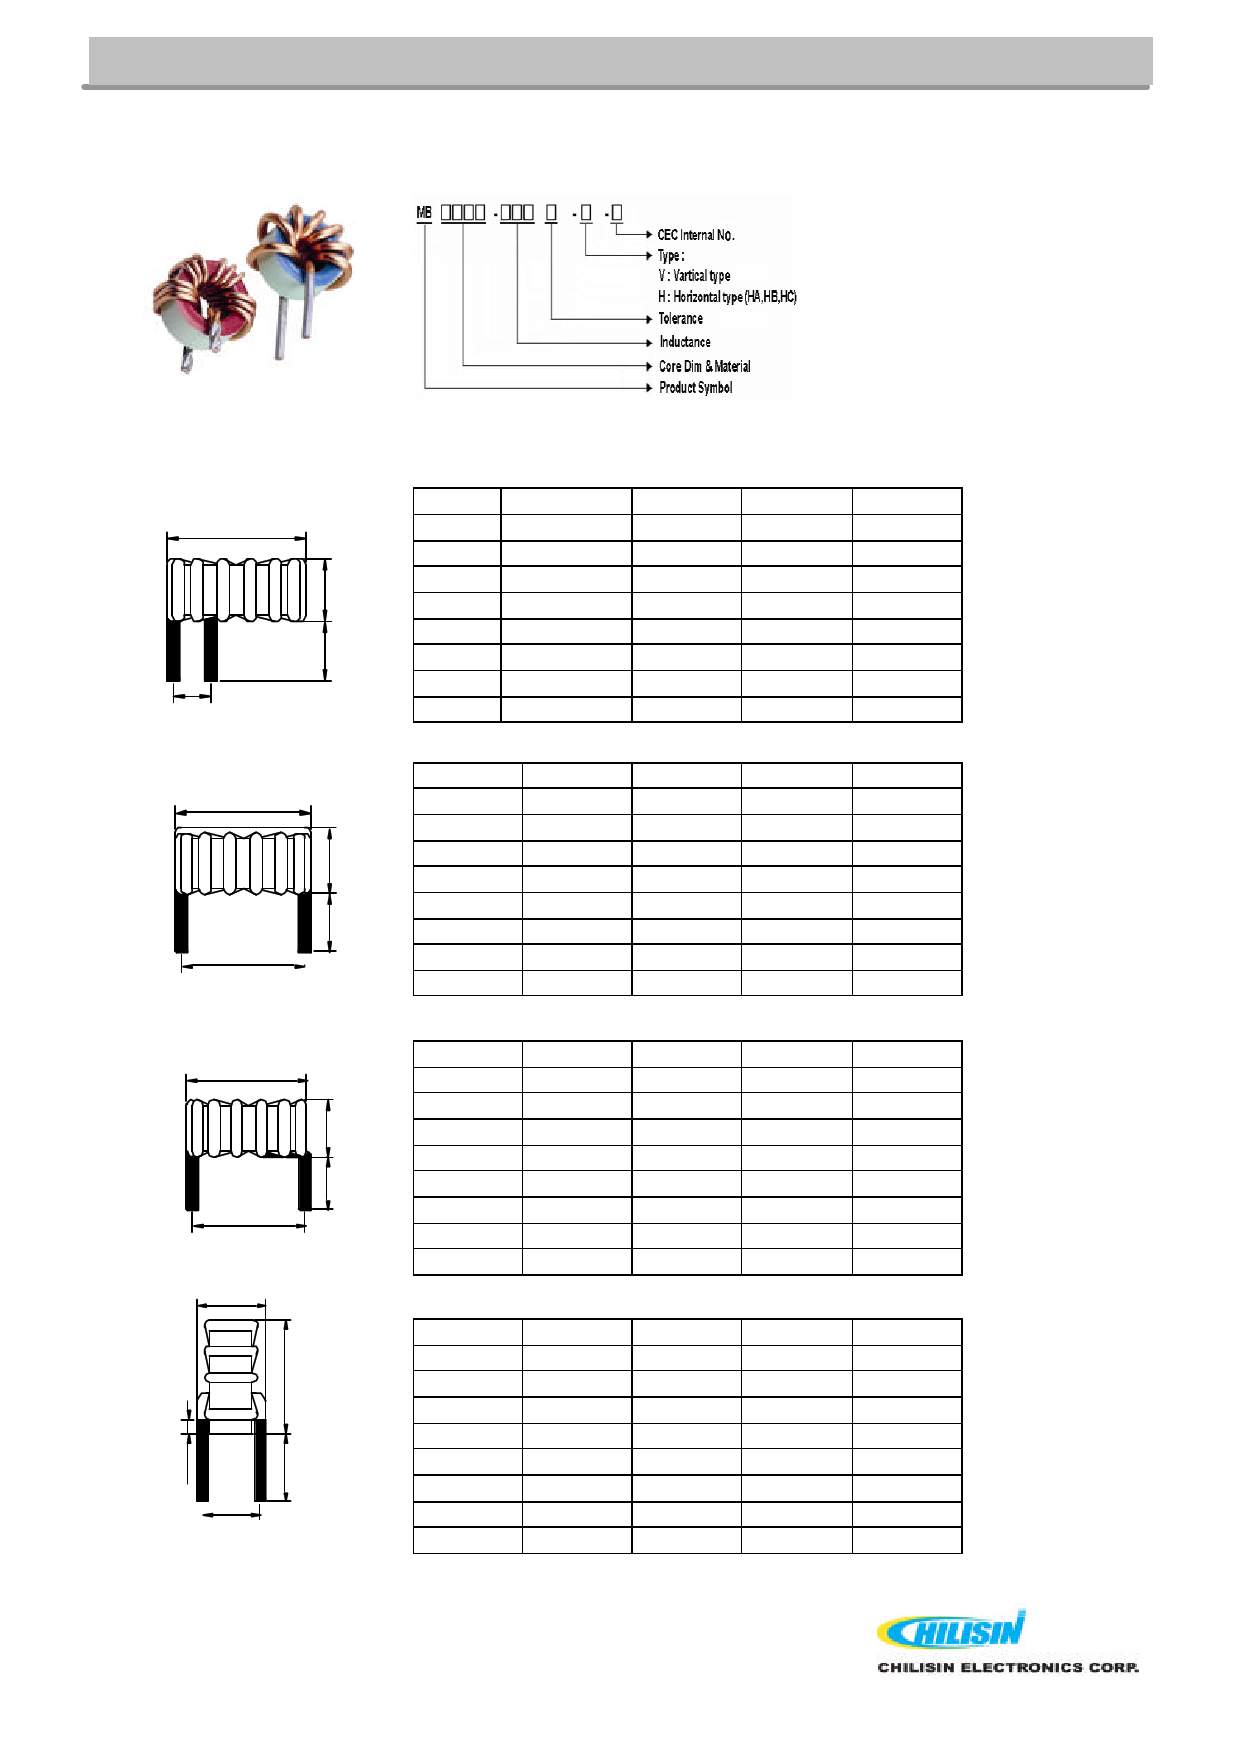 MB5018 데이터시트 및 MB5018 PDF